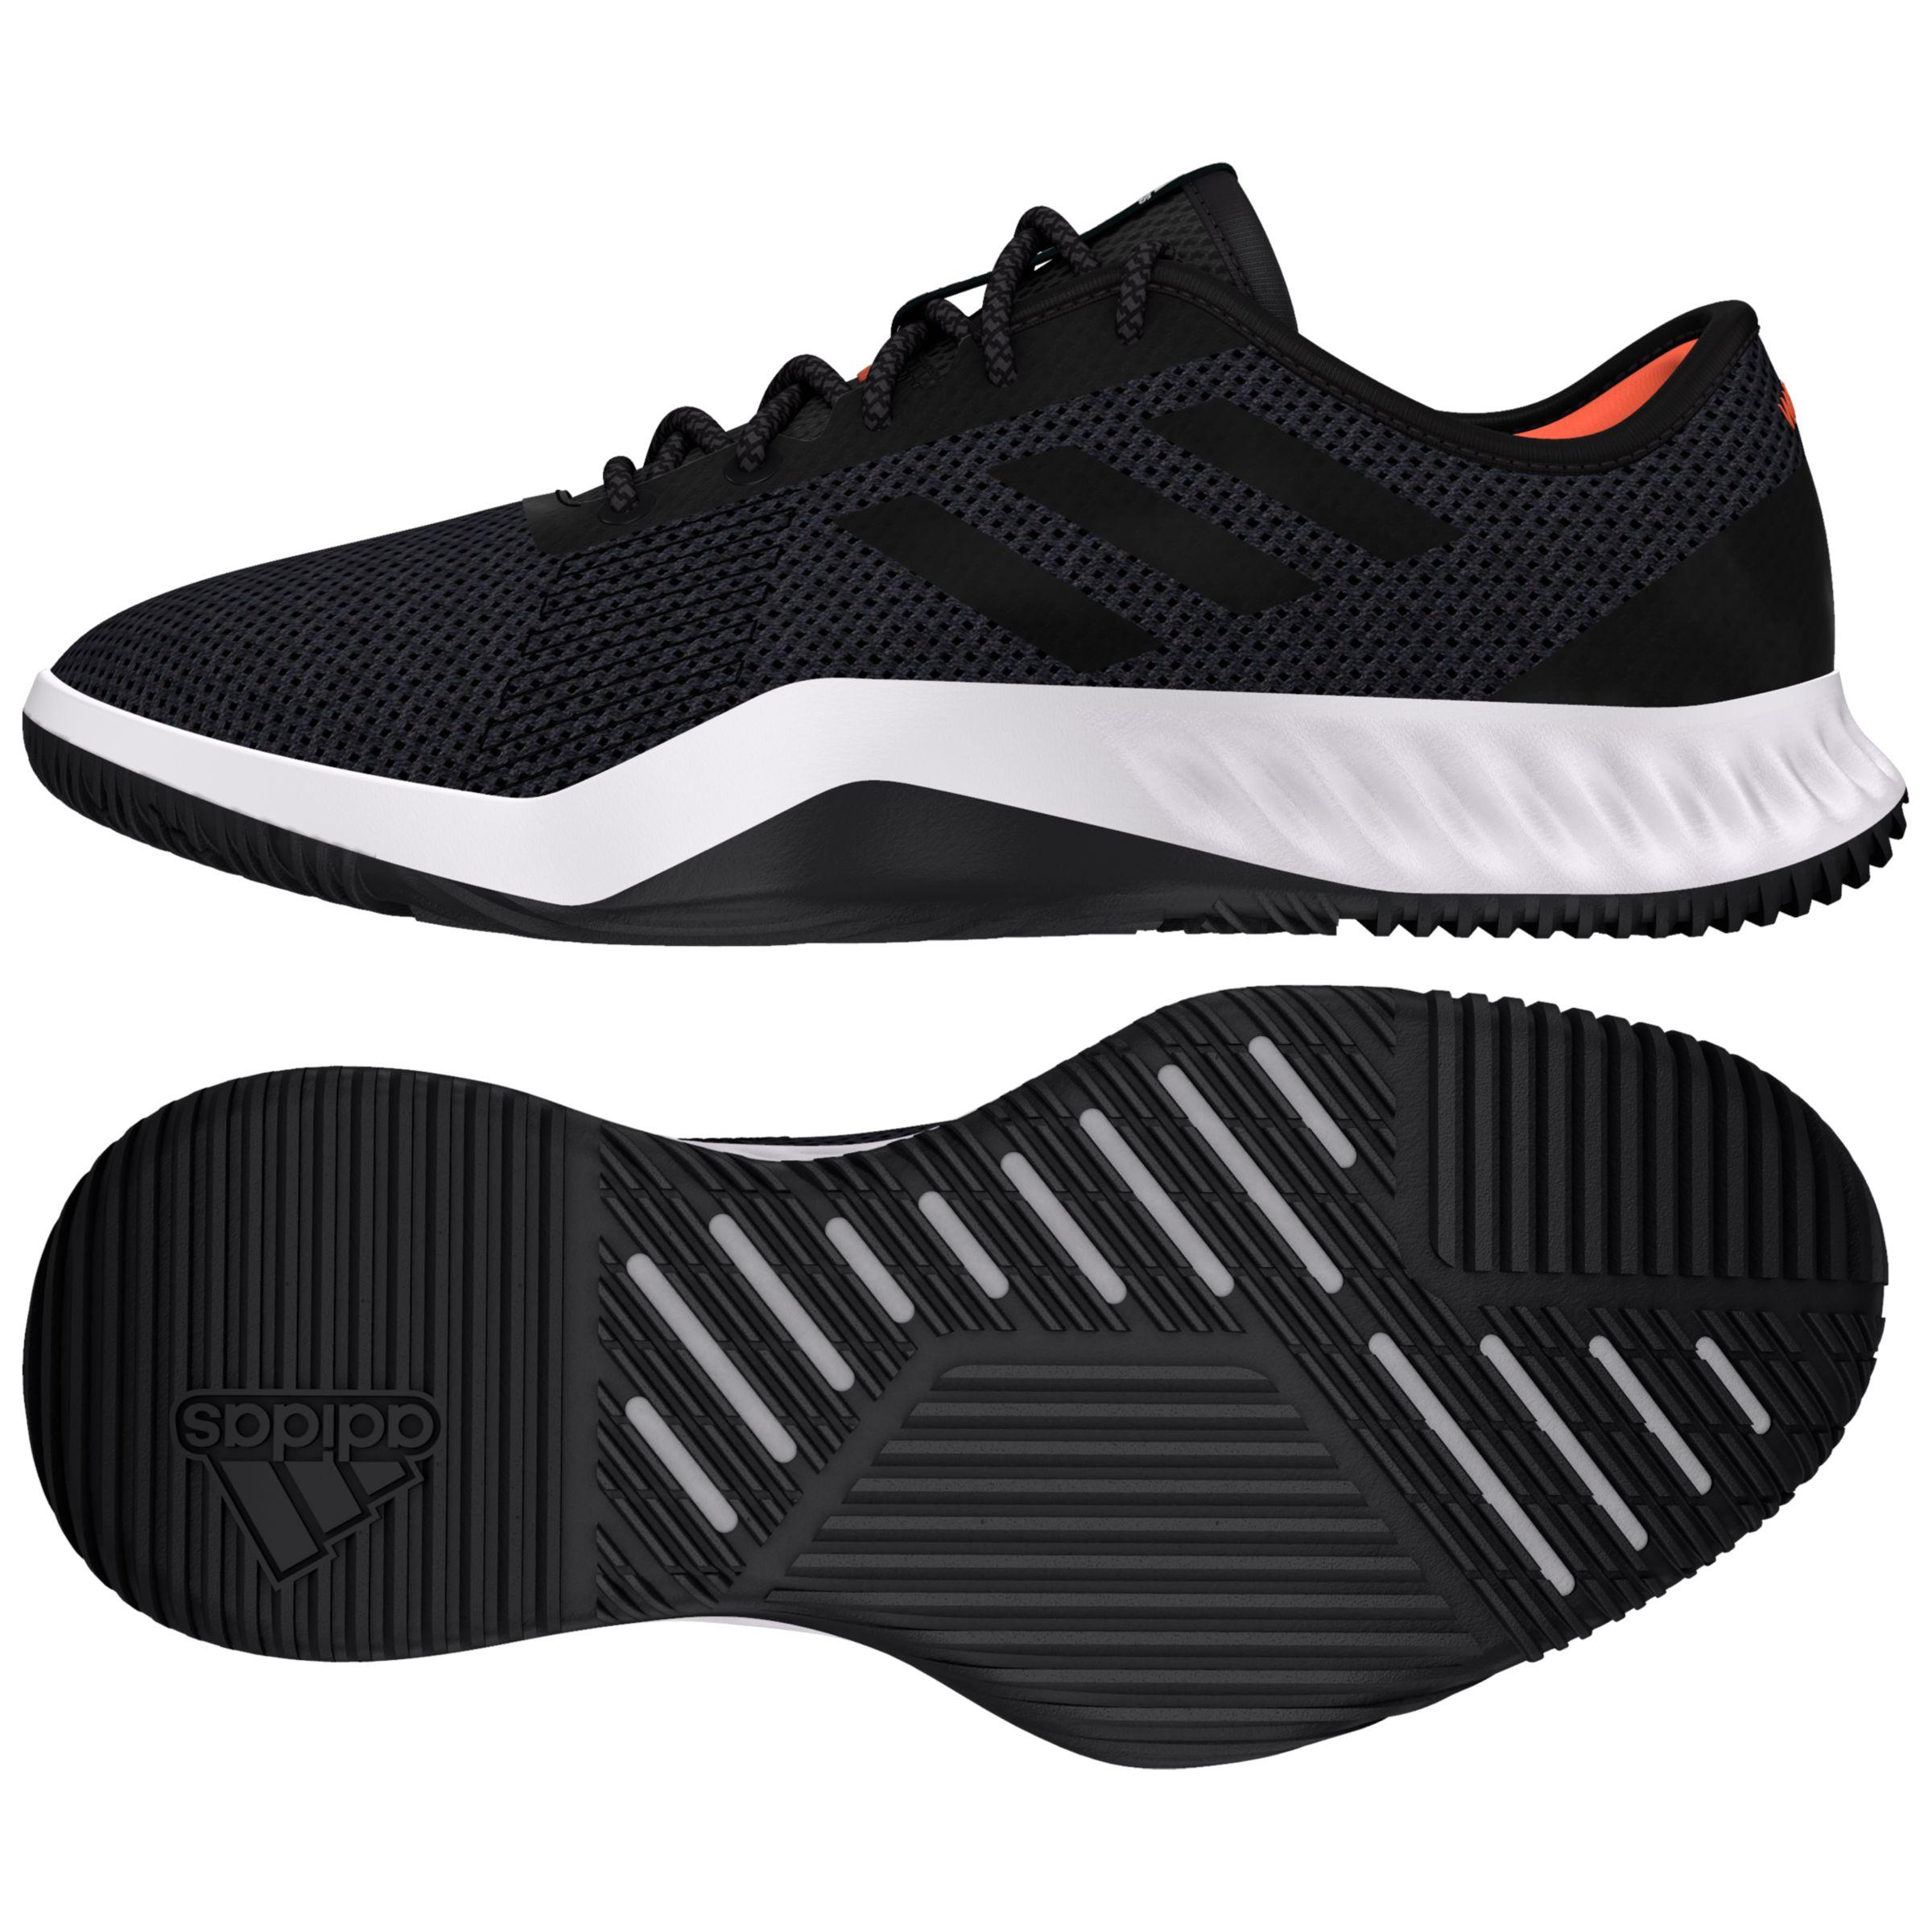 adidas crazytrain lt shoes off 76% - www.usushimd.com